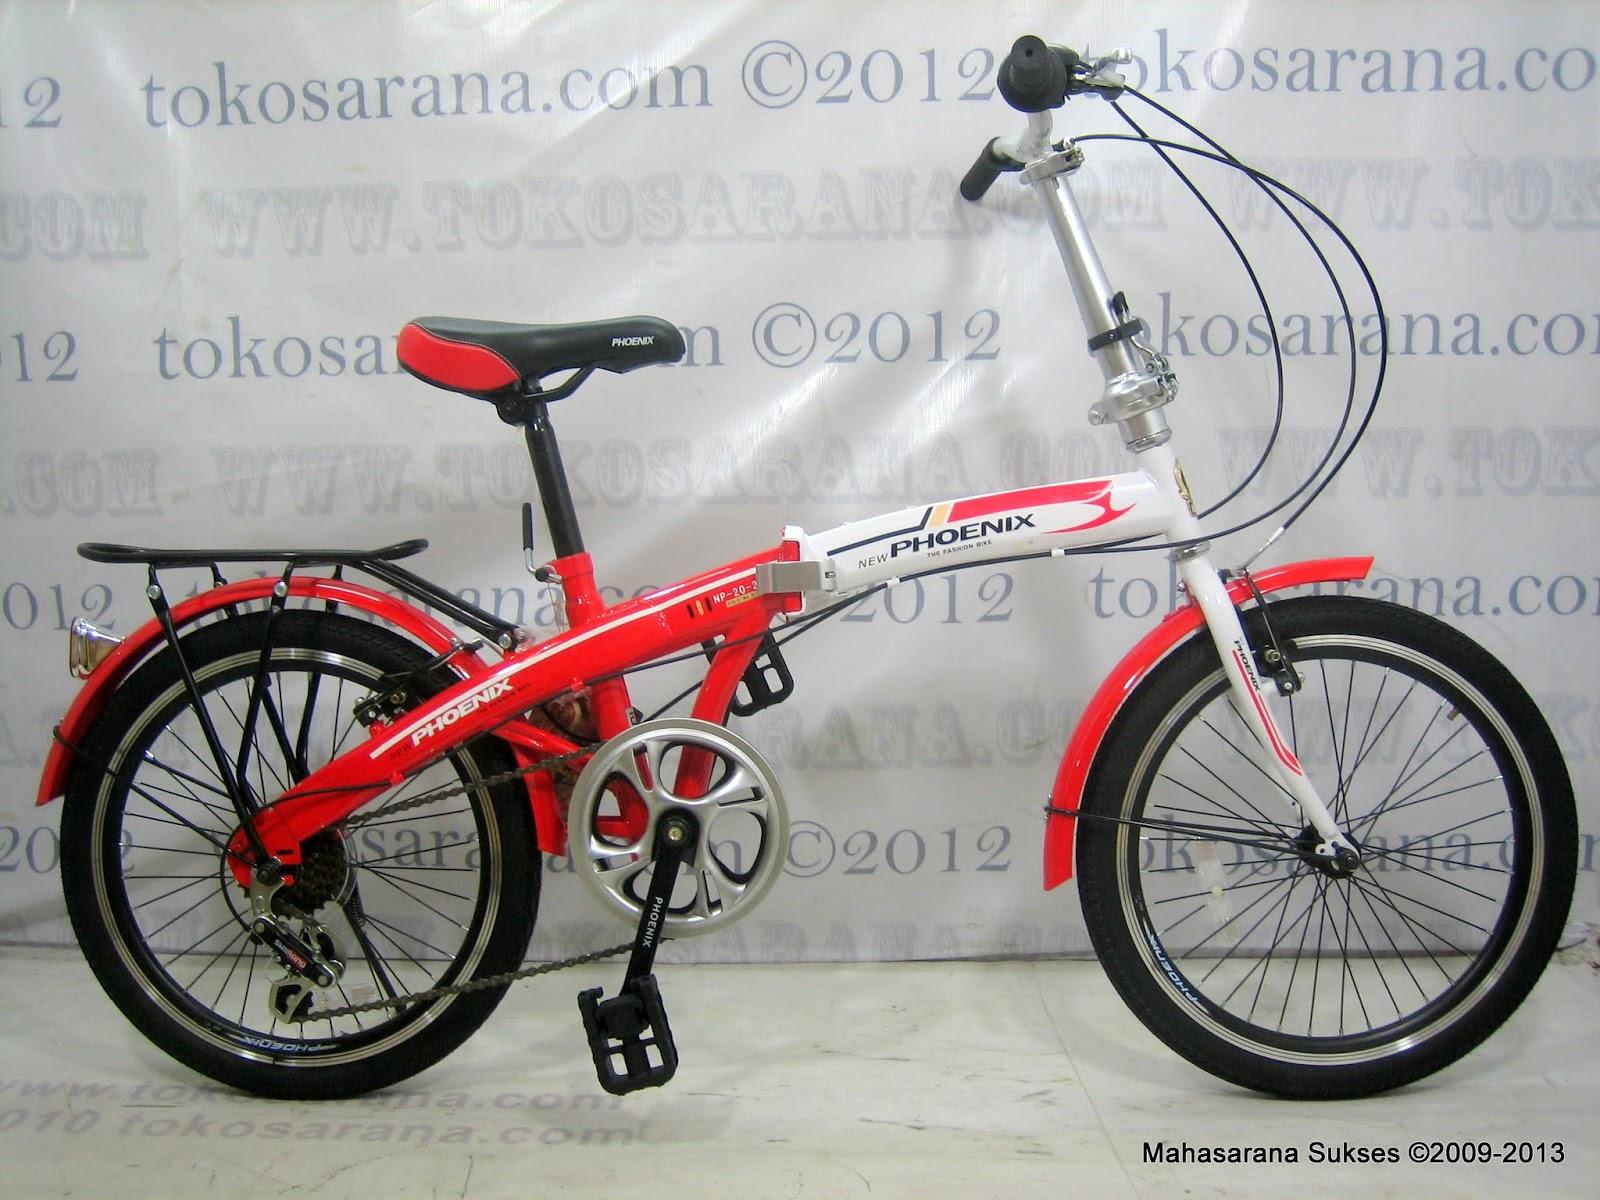 tokosarana™ Mahasarana Sukses™ Sepeda Lipat Phoenix